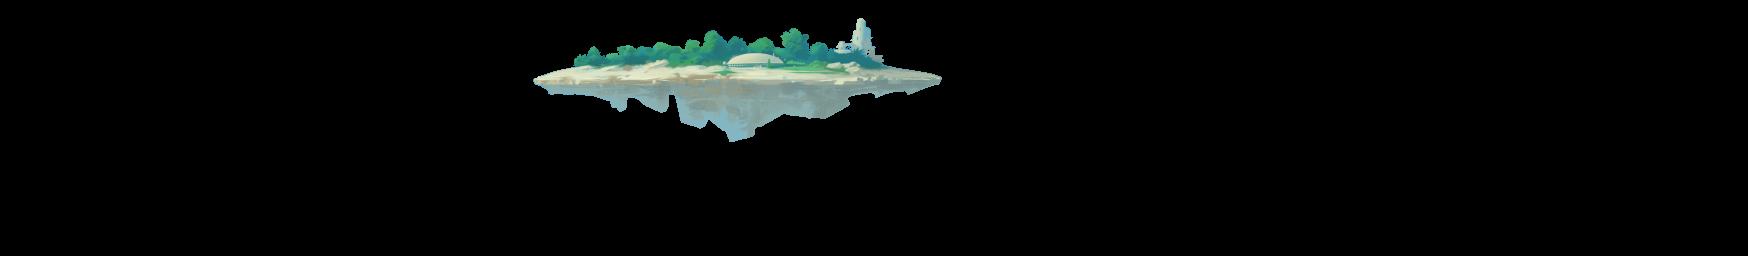 Banner 2 - sky city